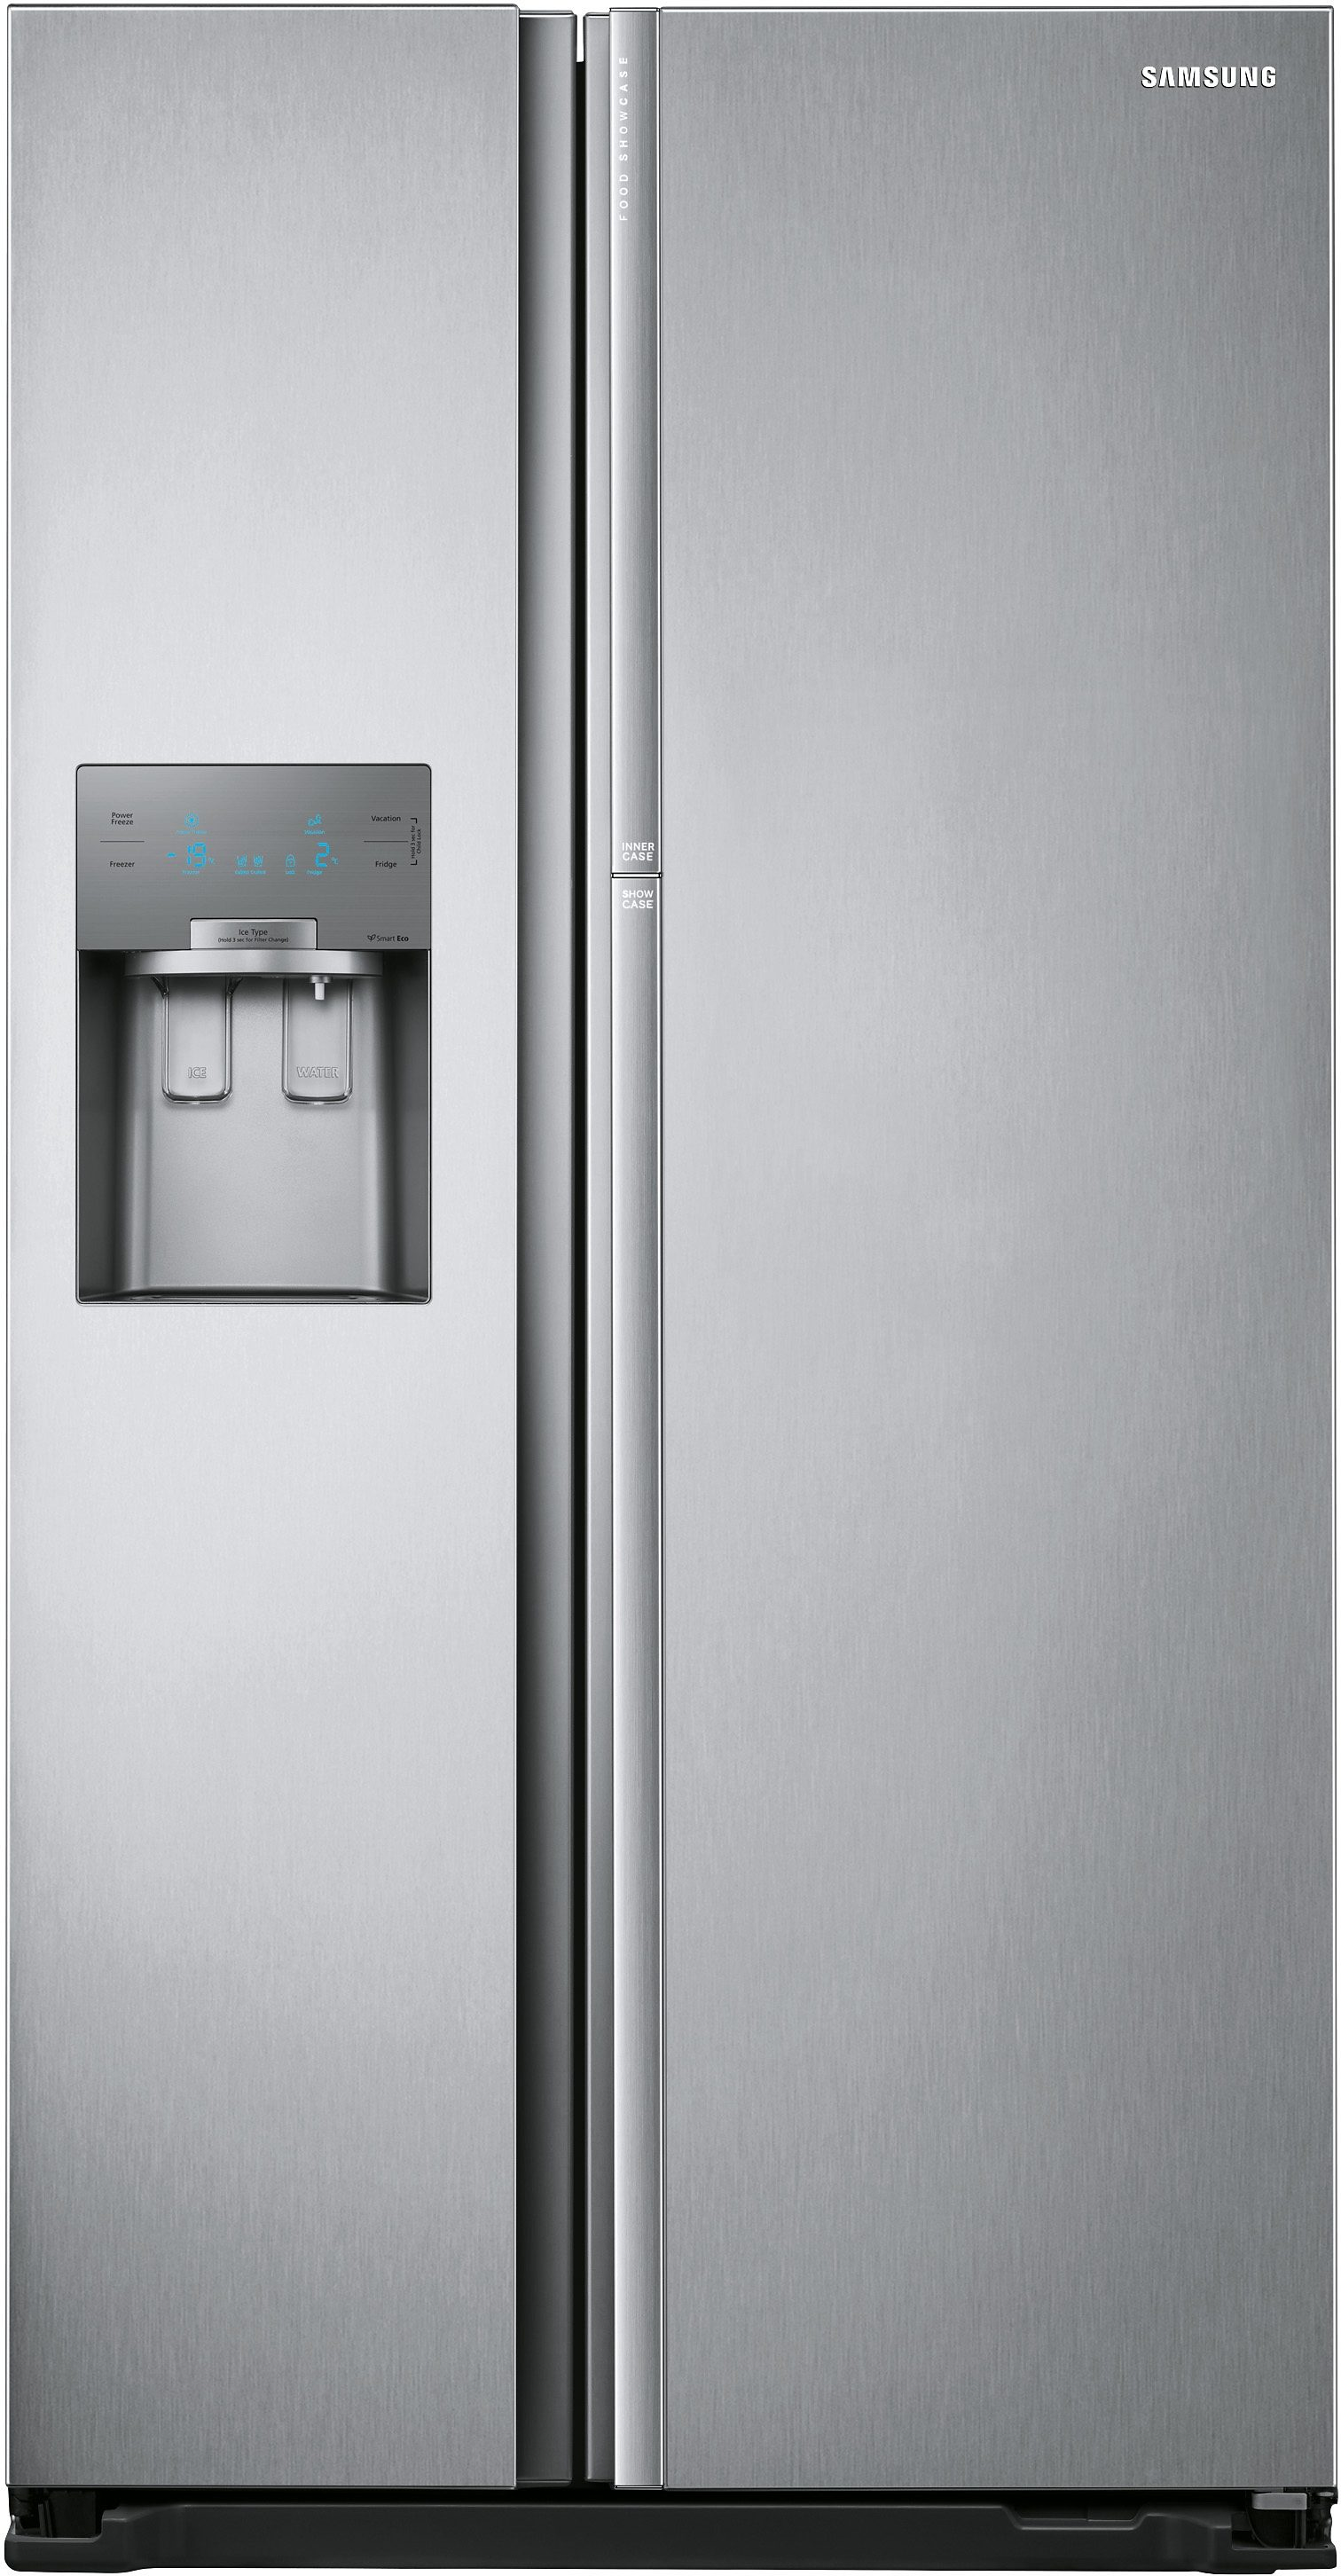 Samsung Side-by-Side RH56J6918SL, 179,4 cm hoch, 91,2 cm breit